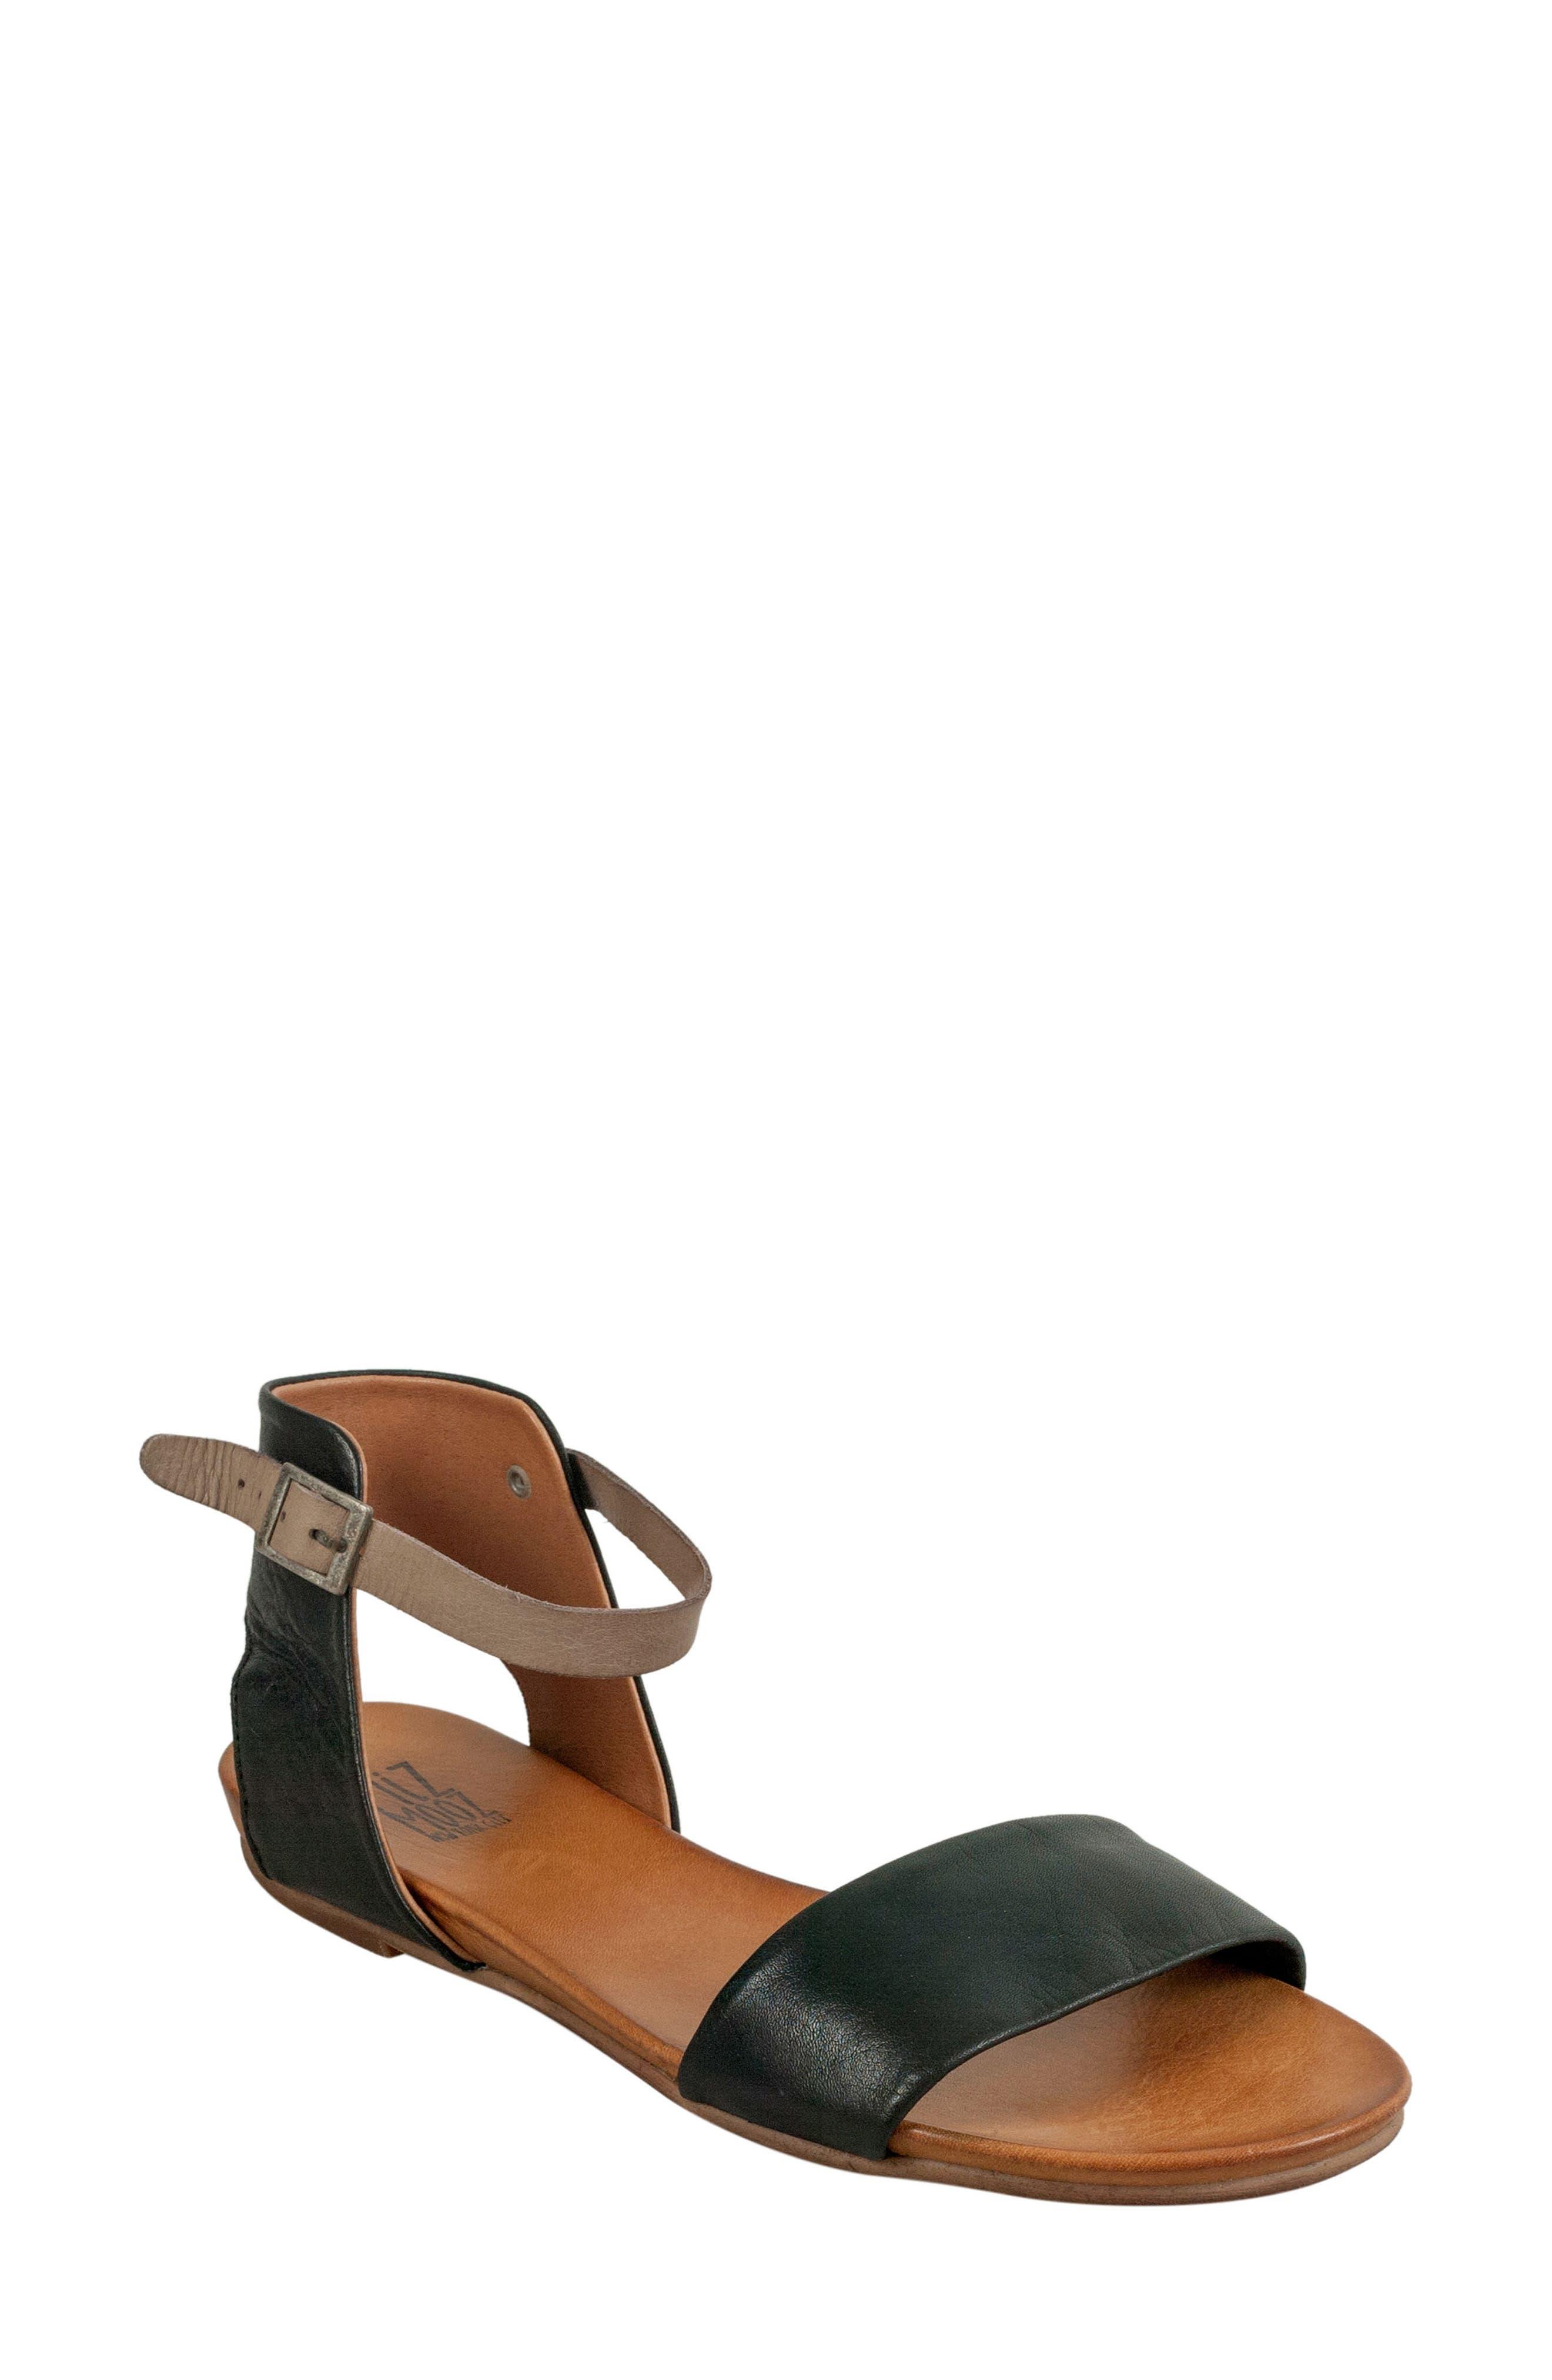 'Alanis' Sandal,                             Main thumbnail 1, color,                             Black Leather